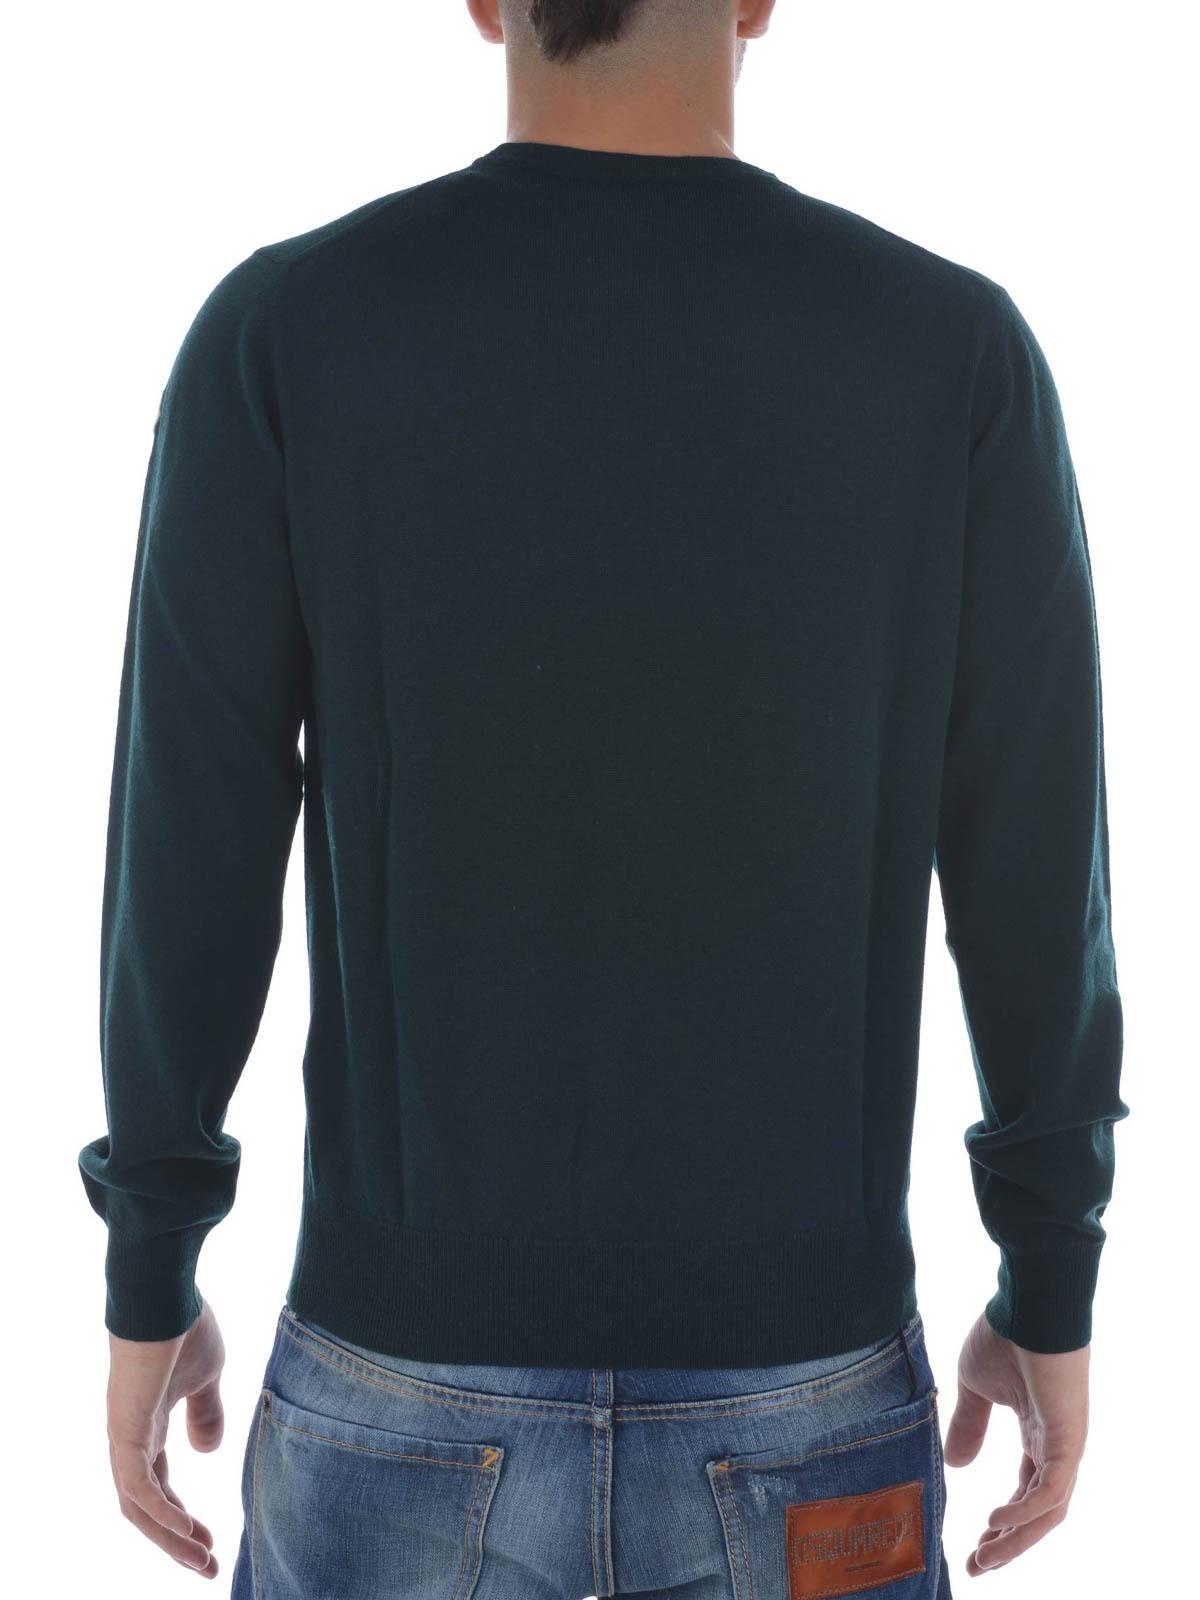 Crew Wool Sweater Moncler Neck Pull Lightweight Rond Col UqEwU5a1